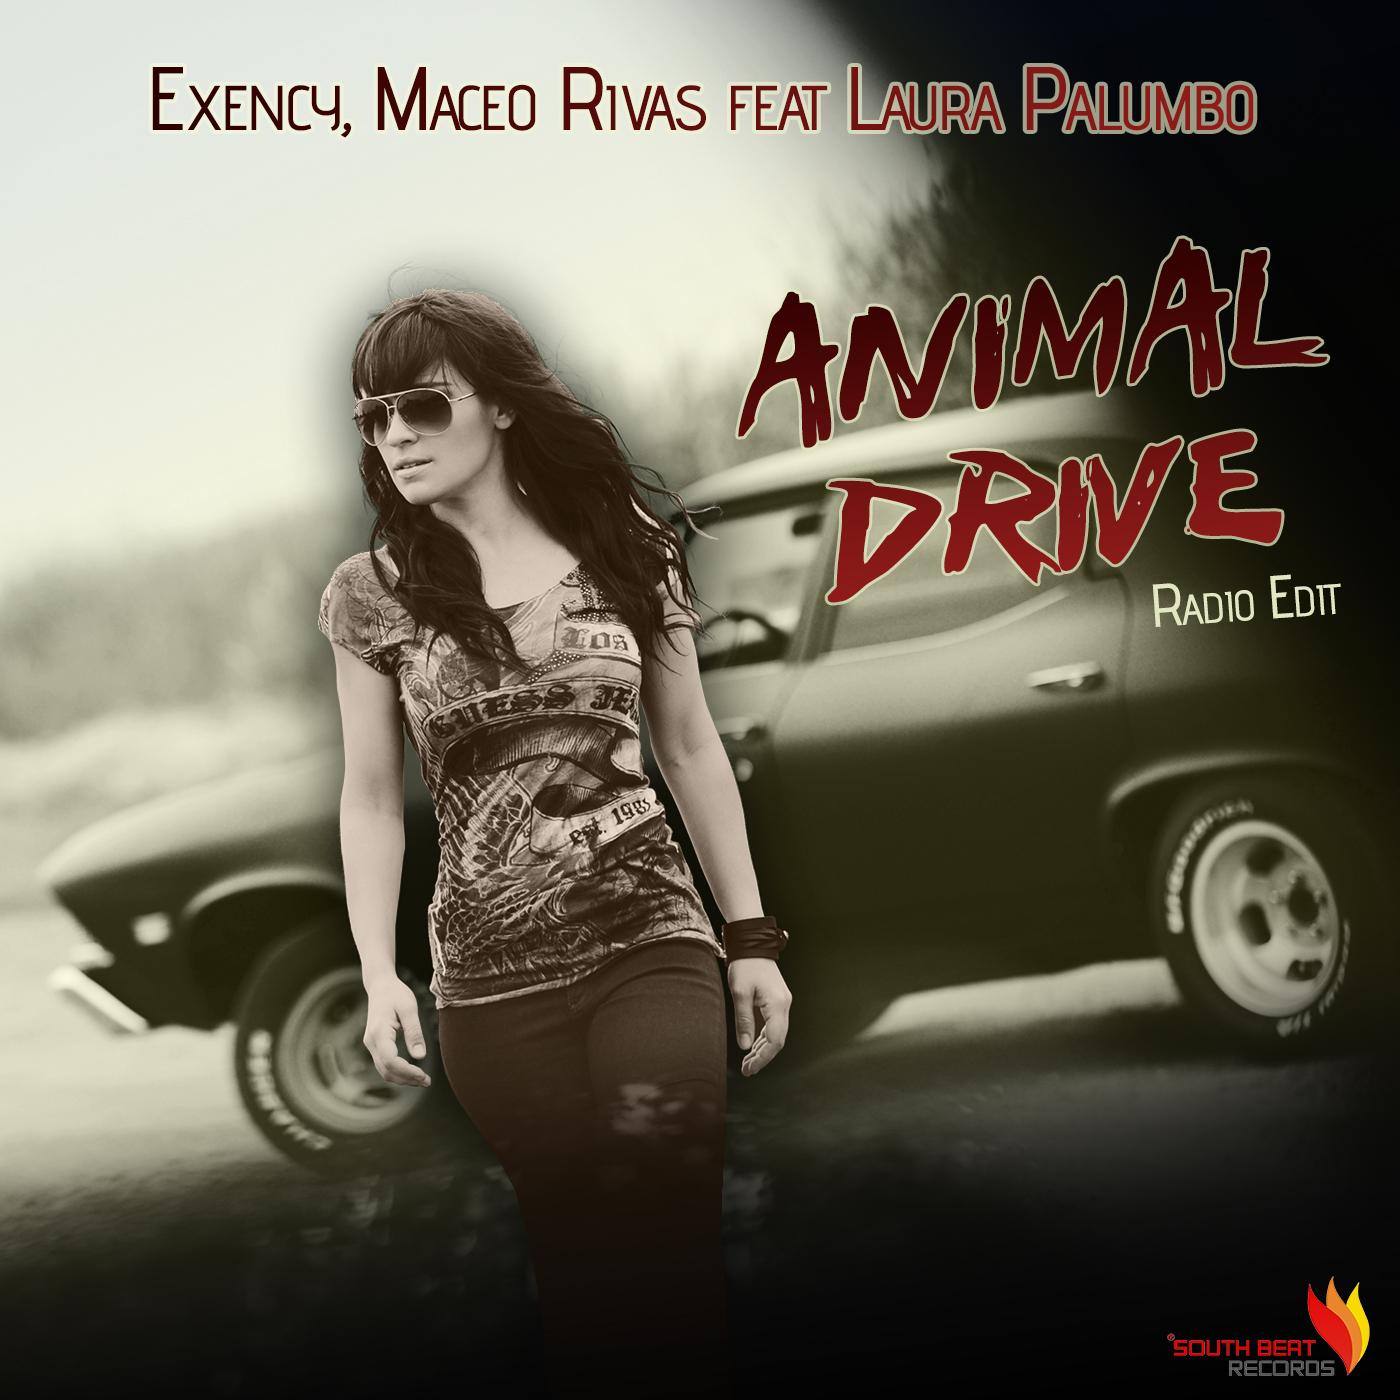 exency-maceo-rivas-feat-laura-palumbo-animal-drive-radio-edit